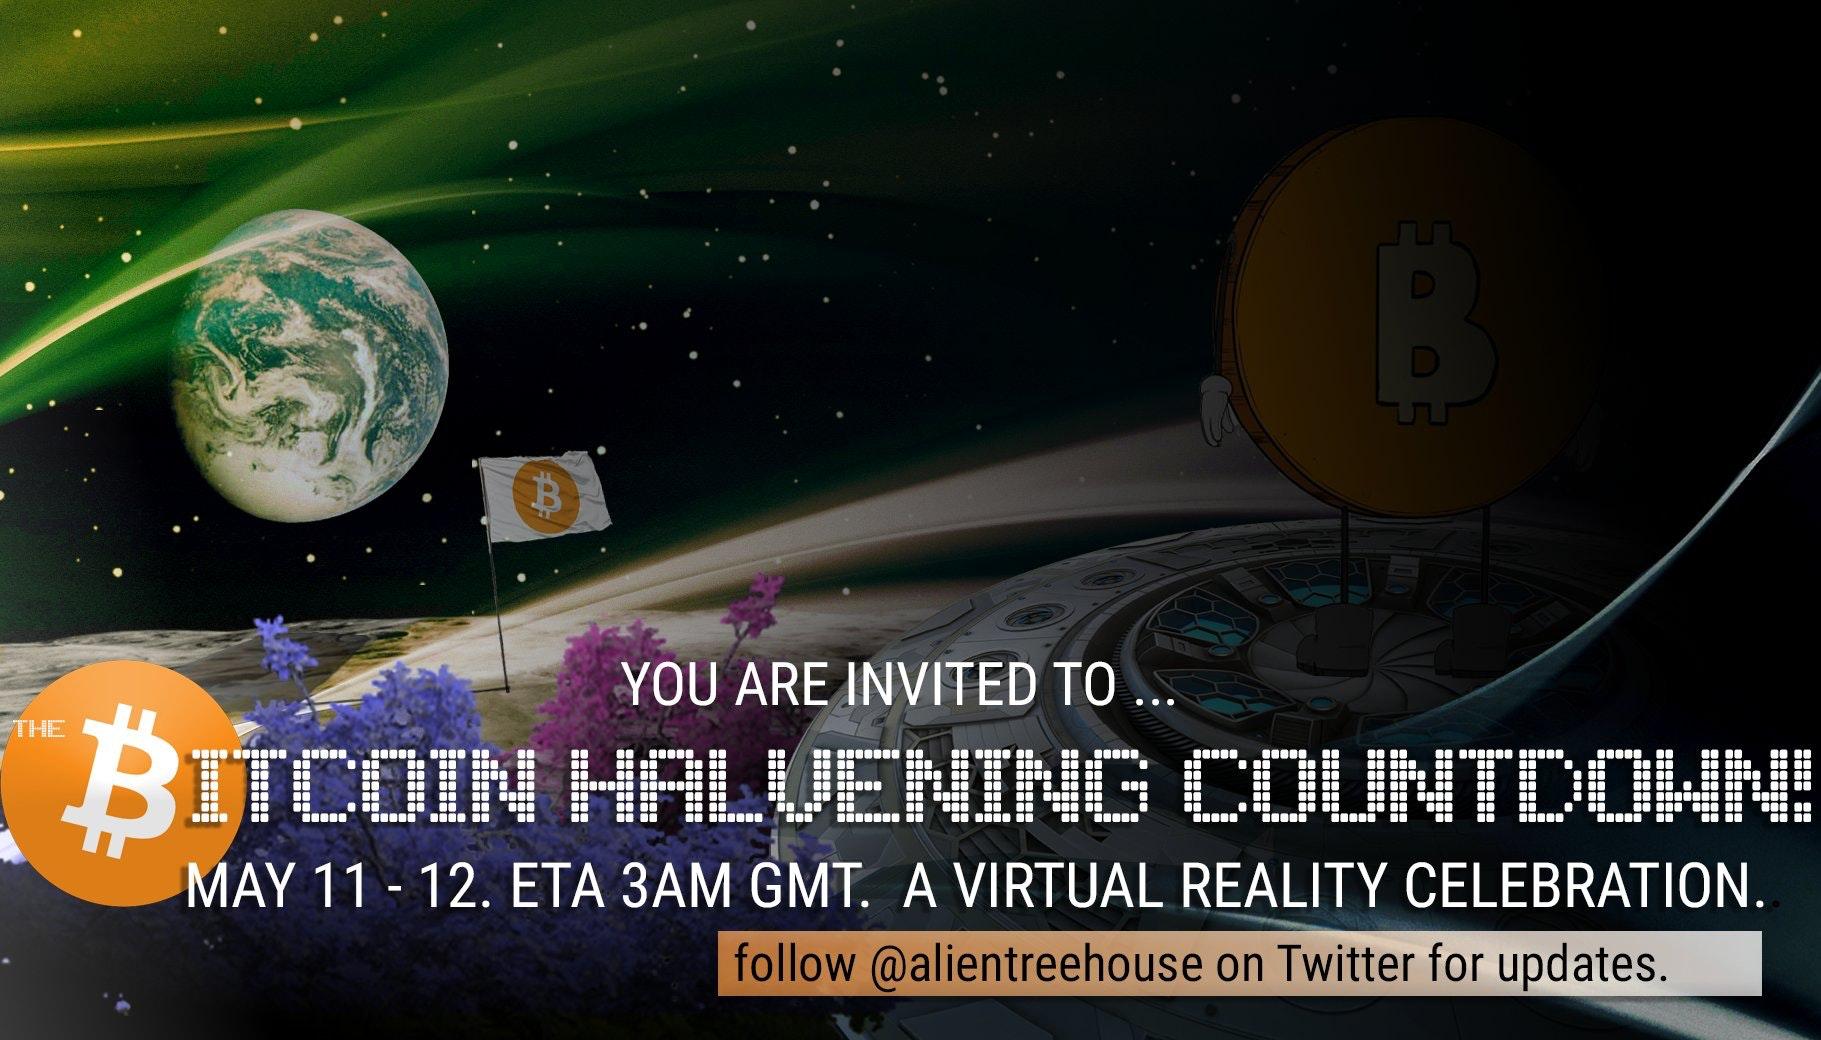 Bitcoin Halvening 2020 Party VR